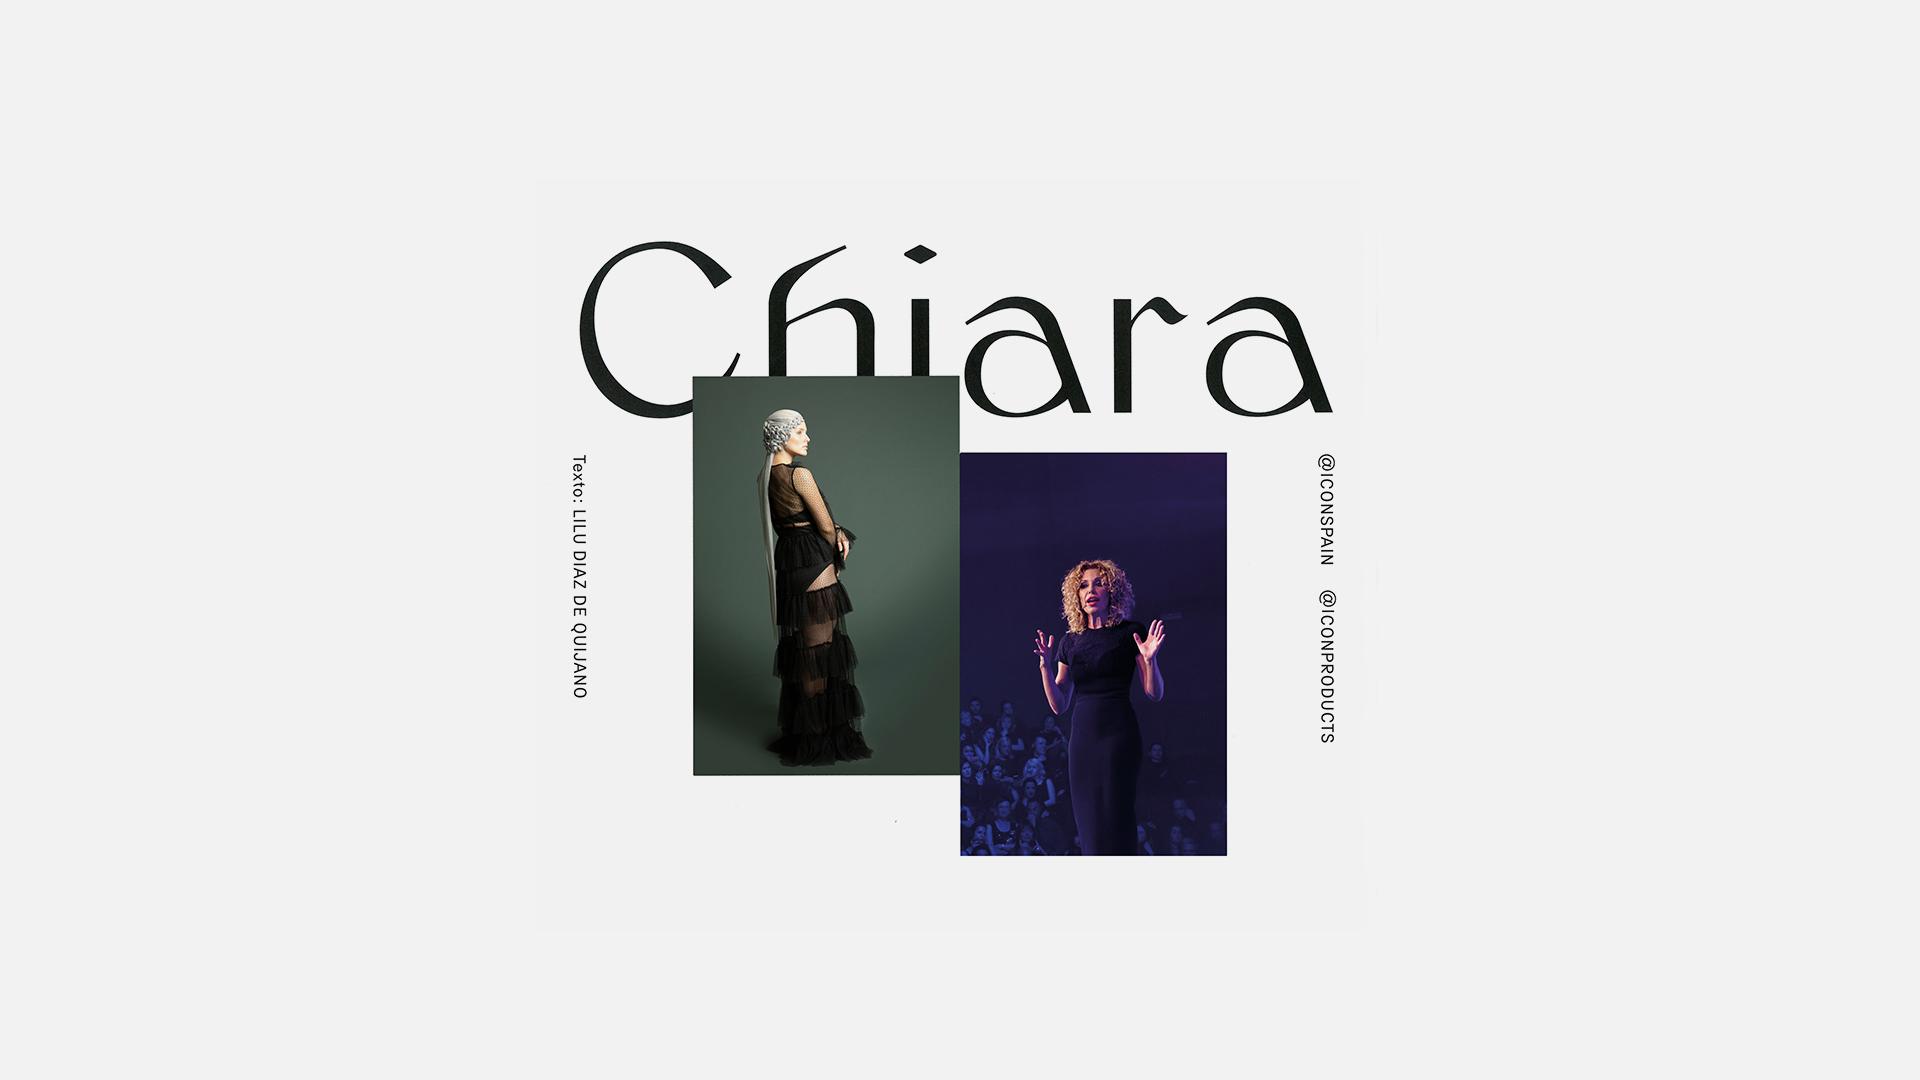 Neo2 entrevista a Chiara, Directora Creativa de I.C.O.N. Products